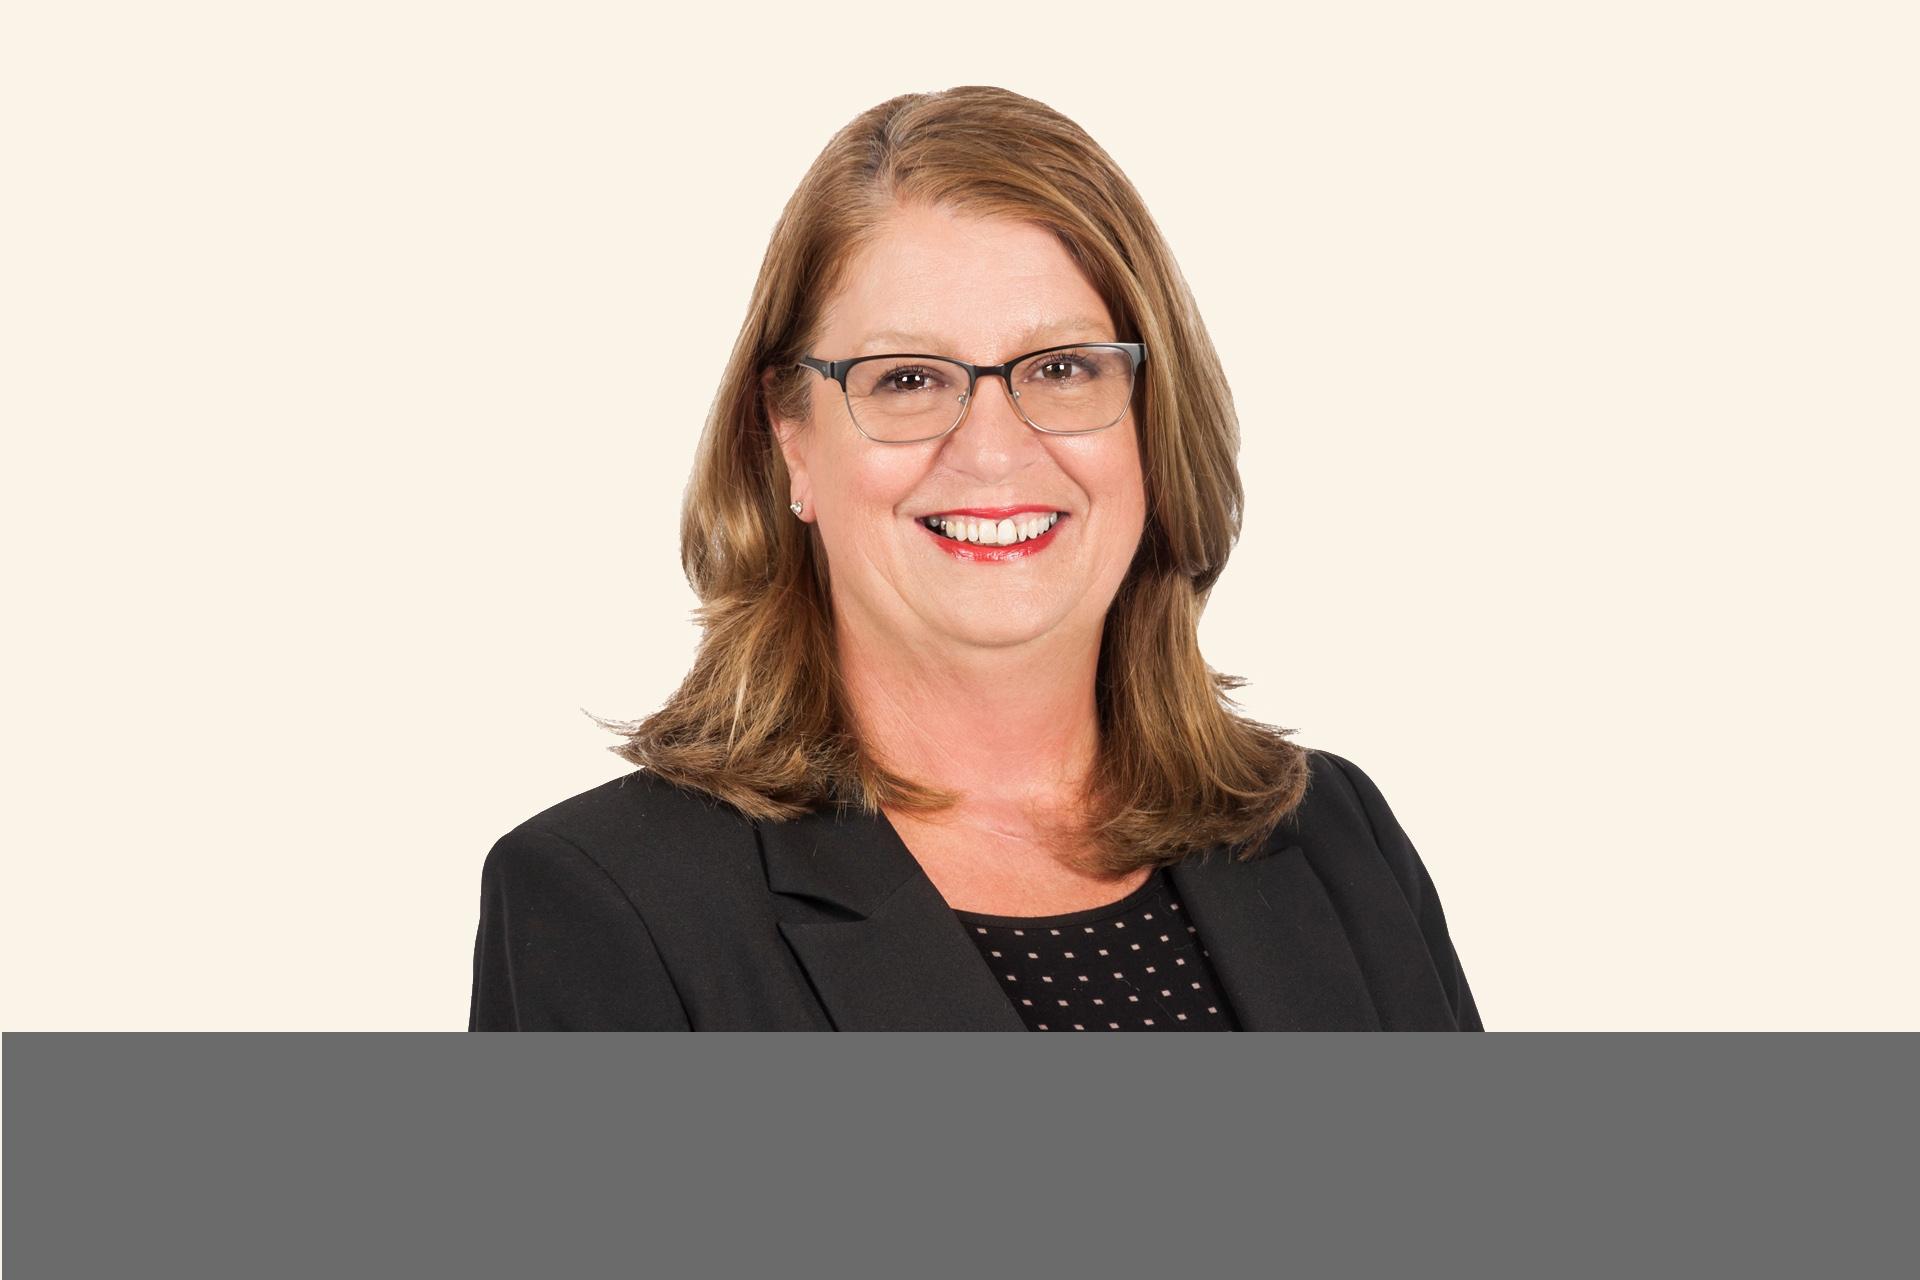 Karen Tickner